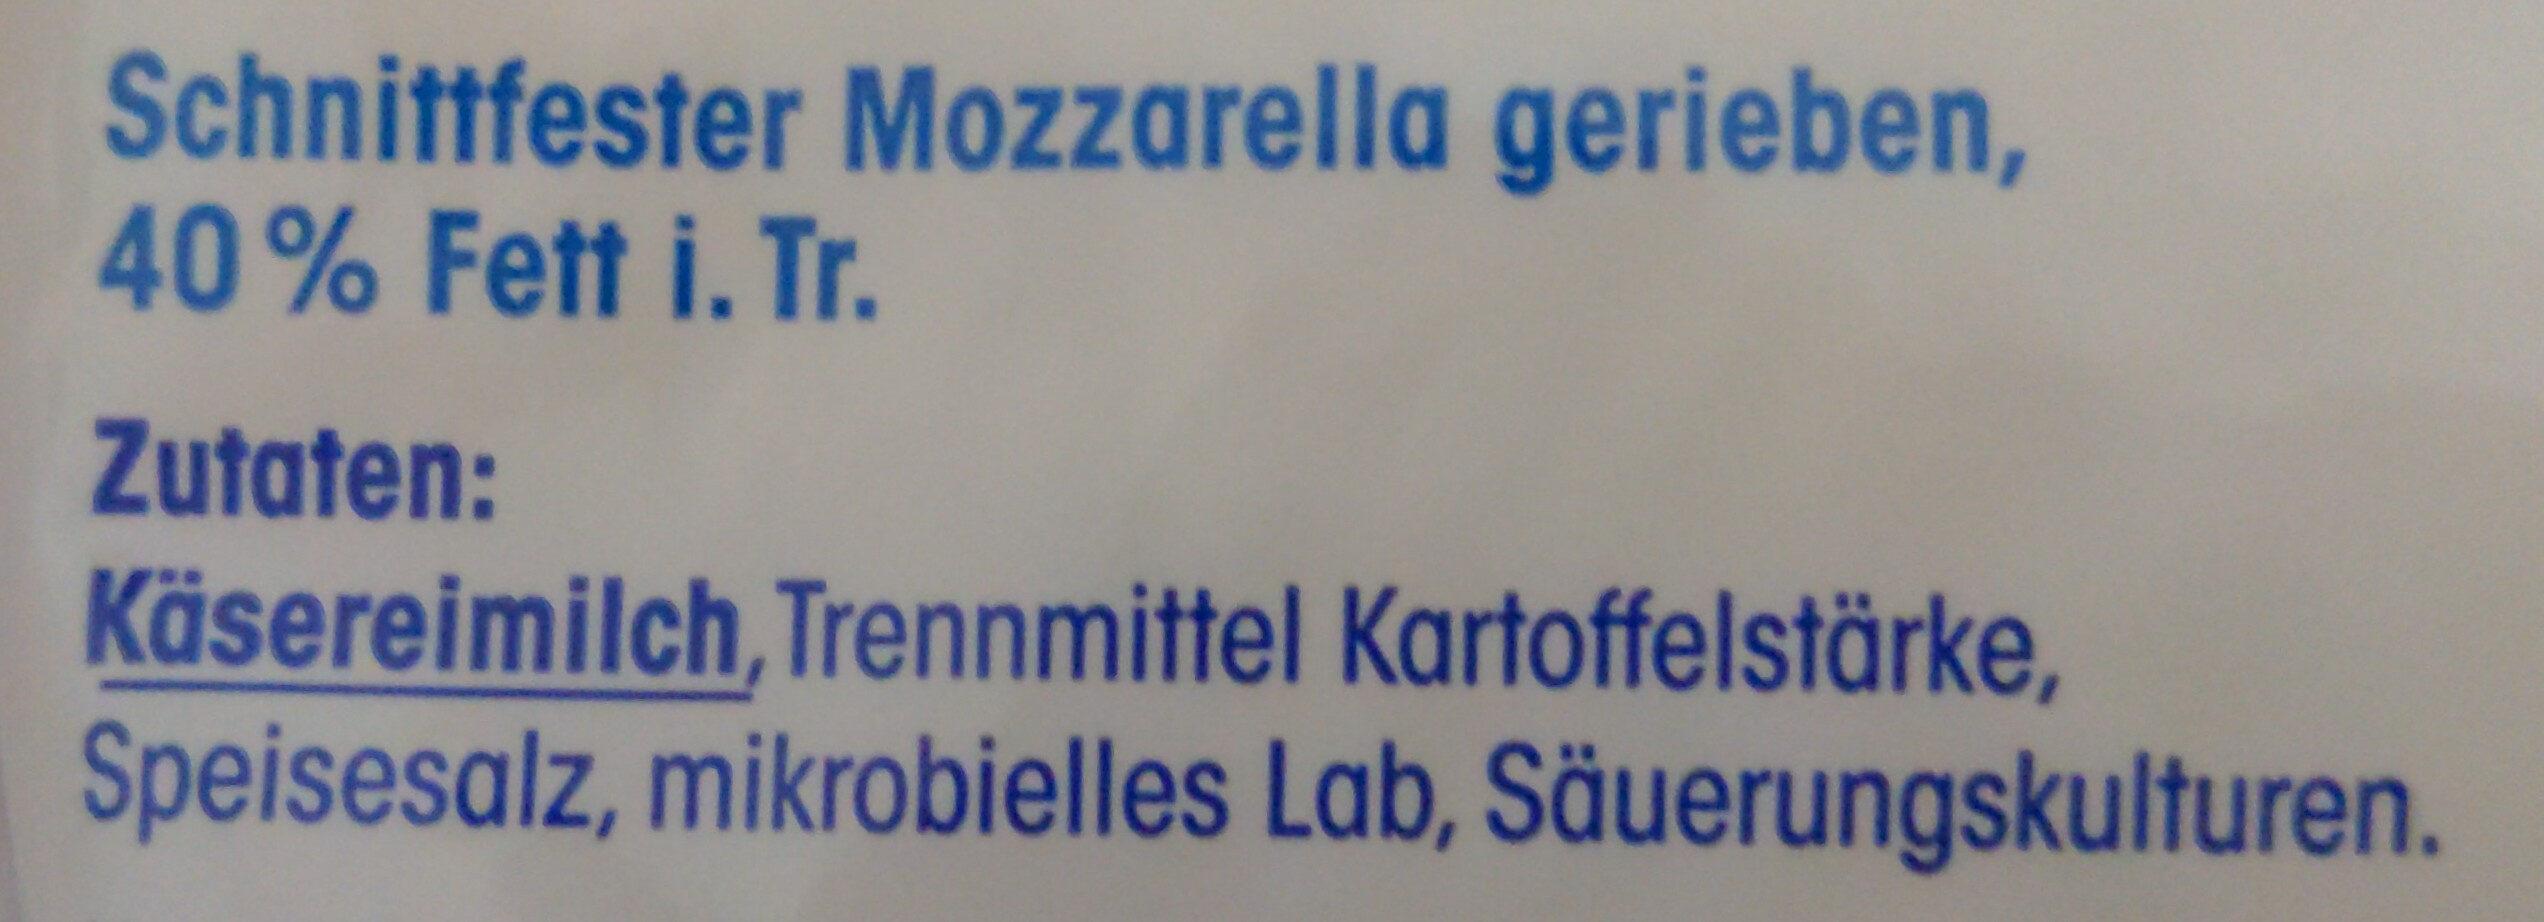 Geriebener Mozzarella - Ingredients - de